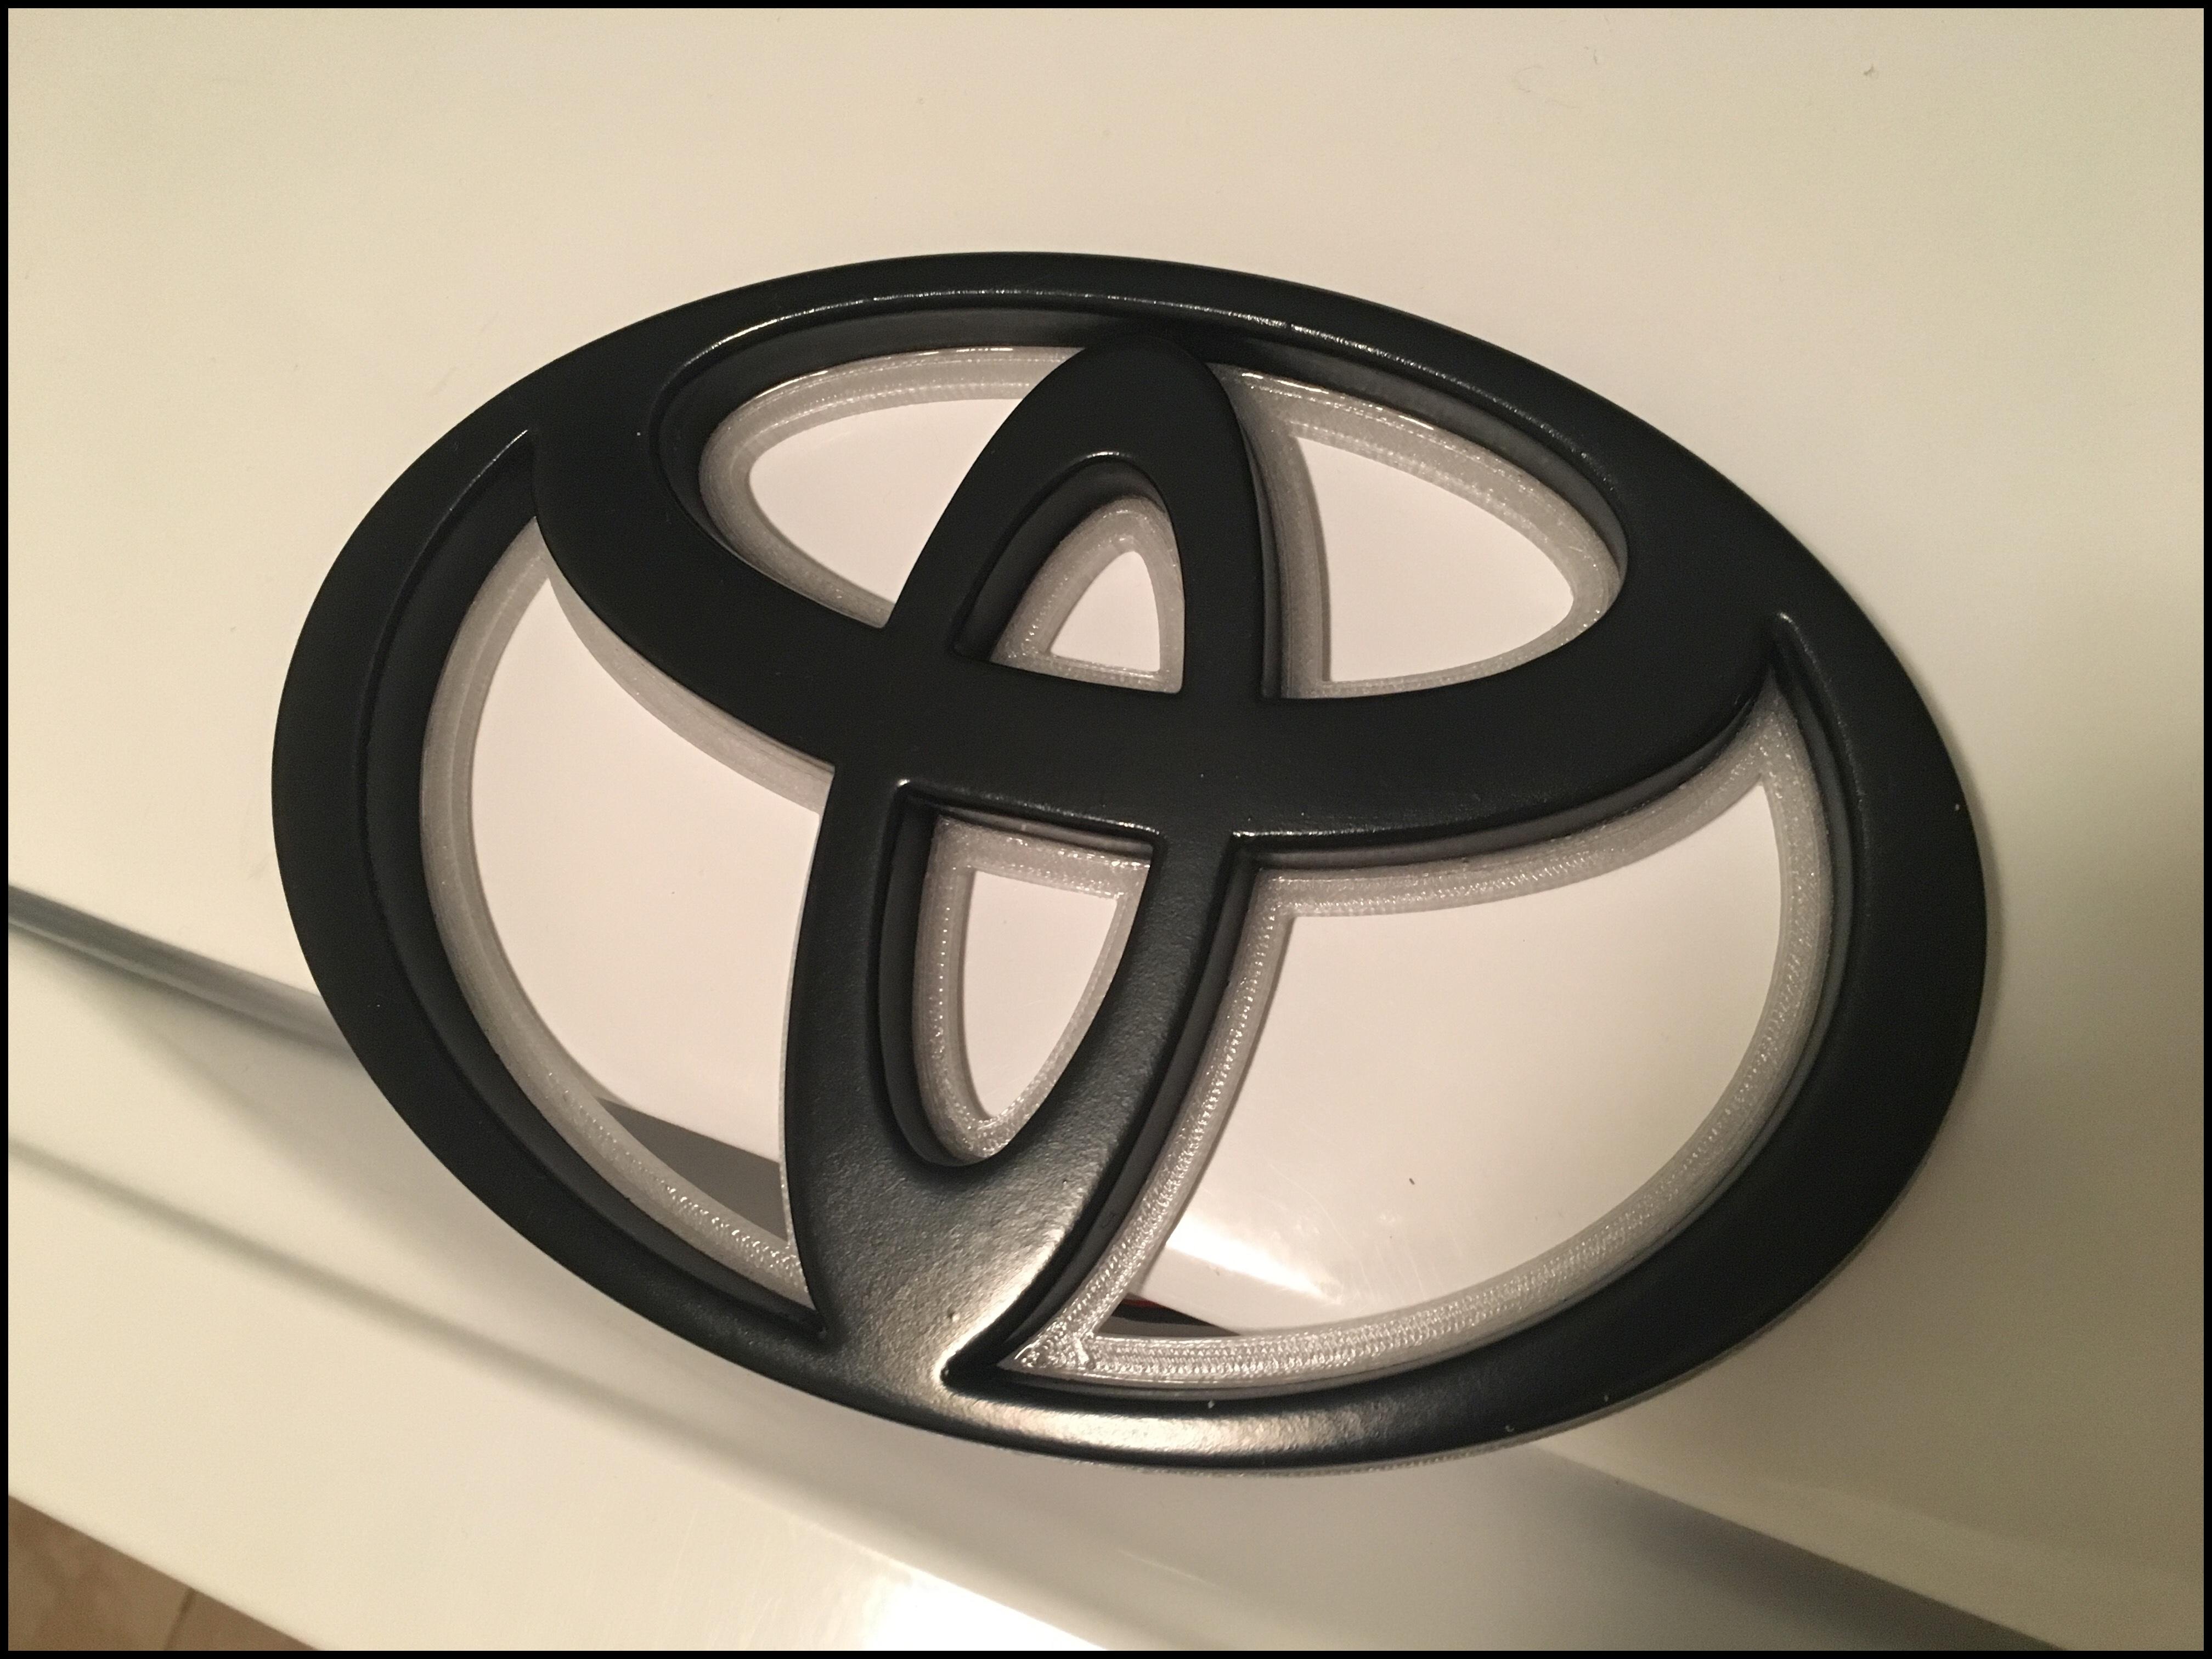 Home Toyota Tundra CUSTOM LED BACKLIT TUNDRA EMBLEM